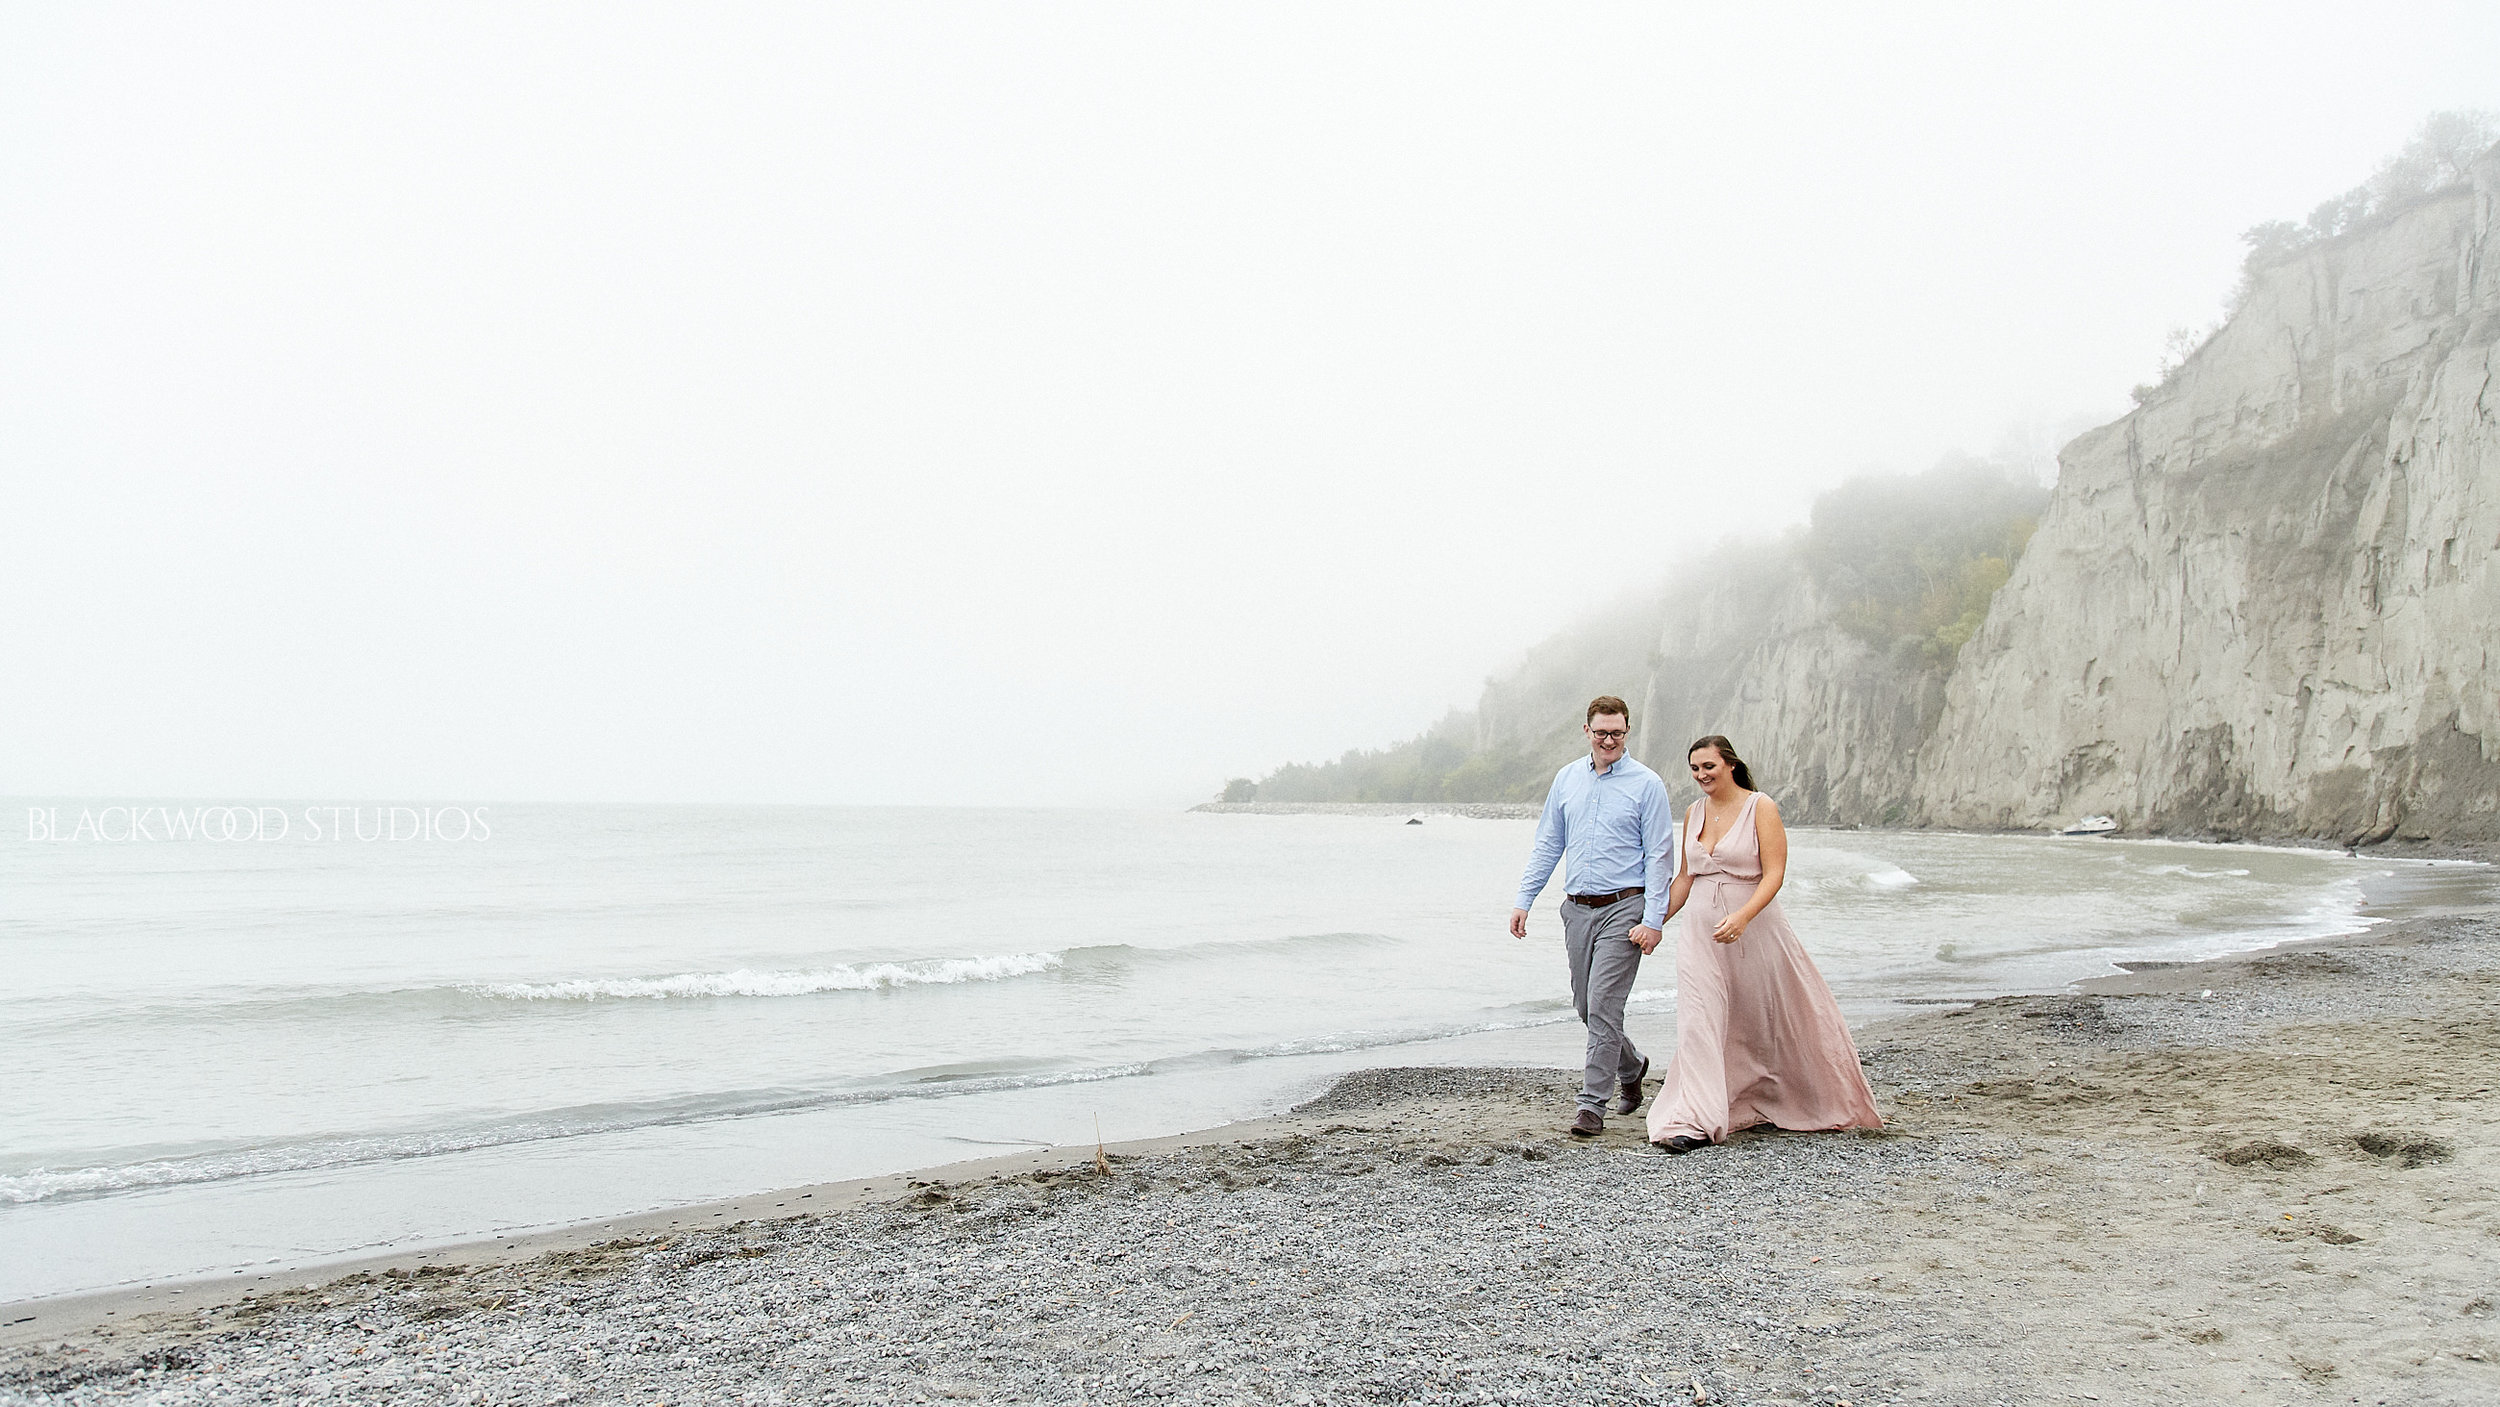 Blackwood-Studios-20181008-17-34-14-Justin-and-Samantha-Engagement-Photography-foggy-Scaraborough-Bluffs-Park-Ontario.jpg